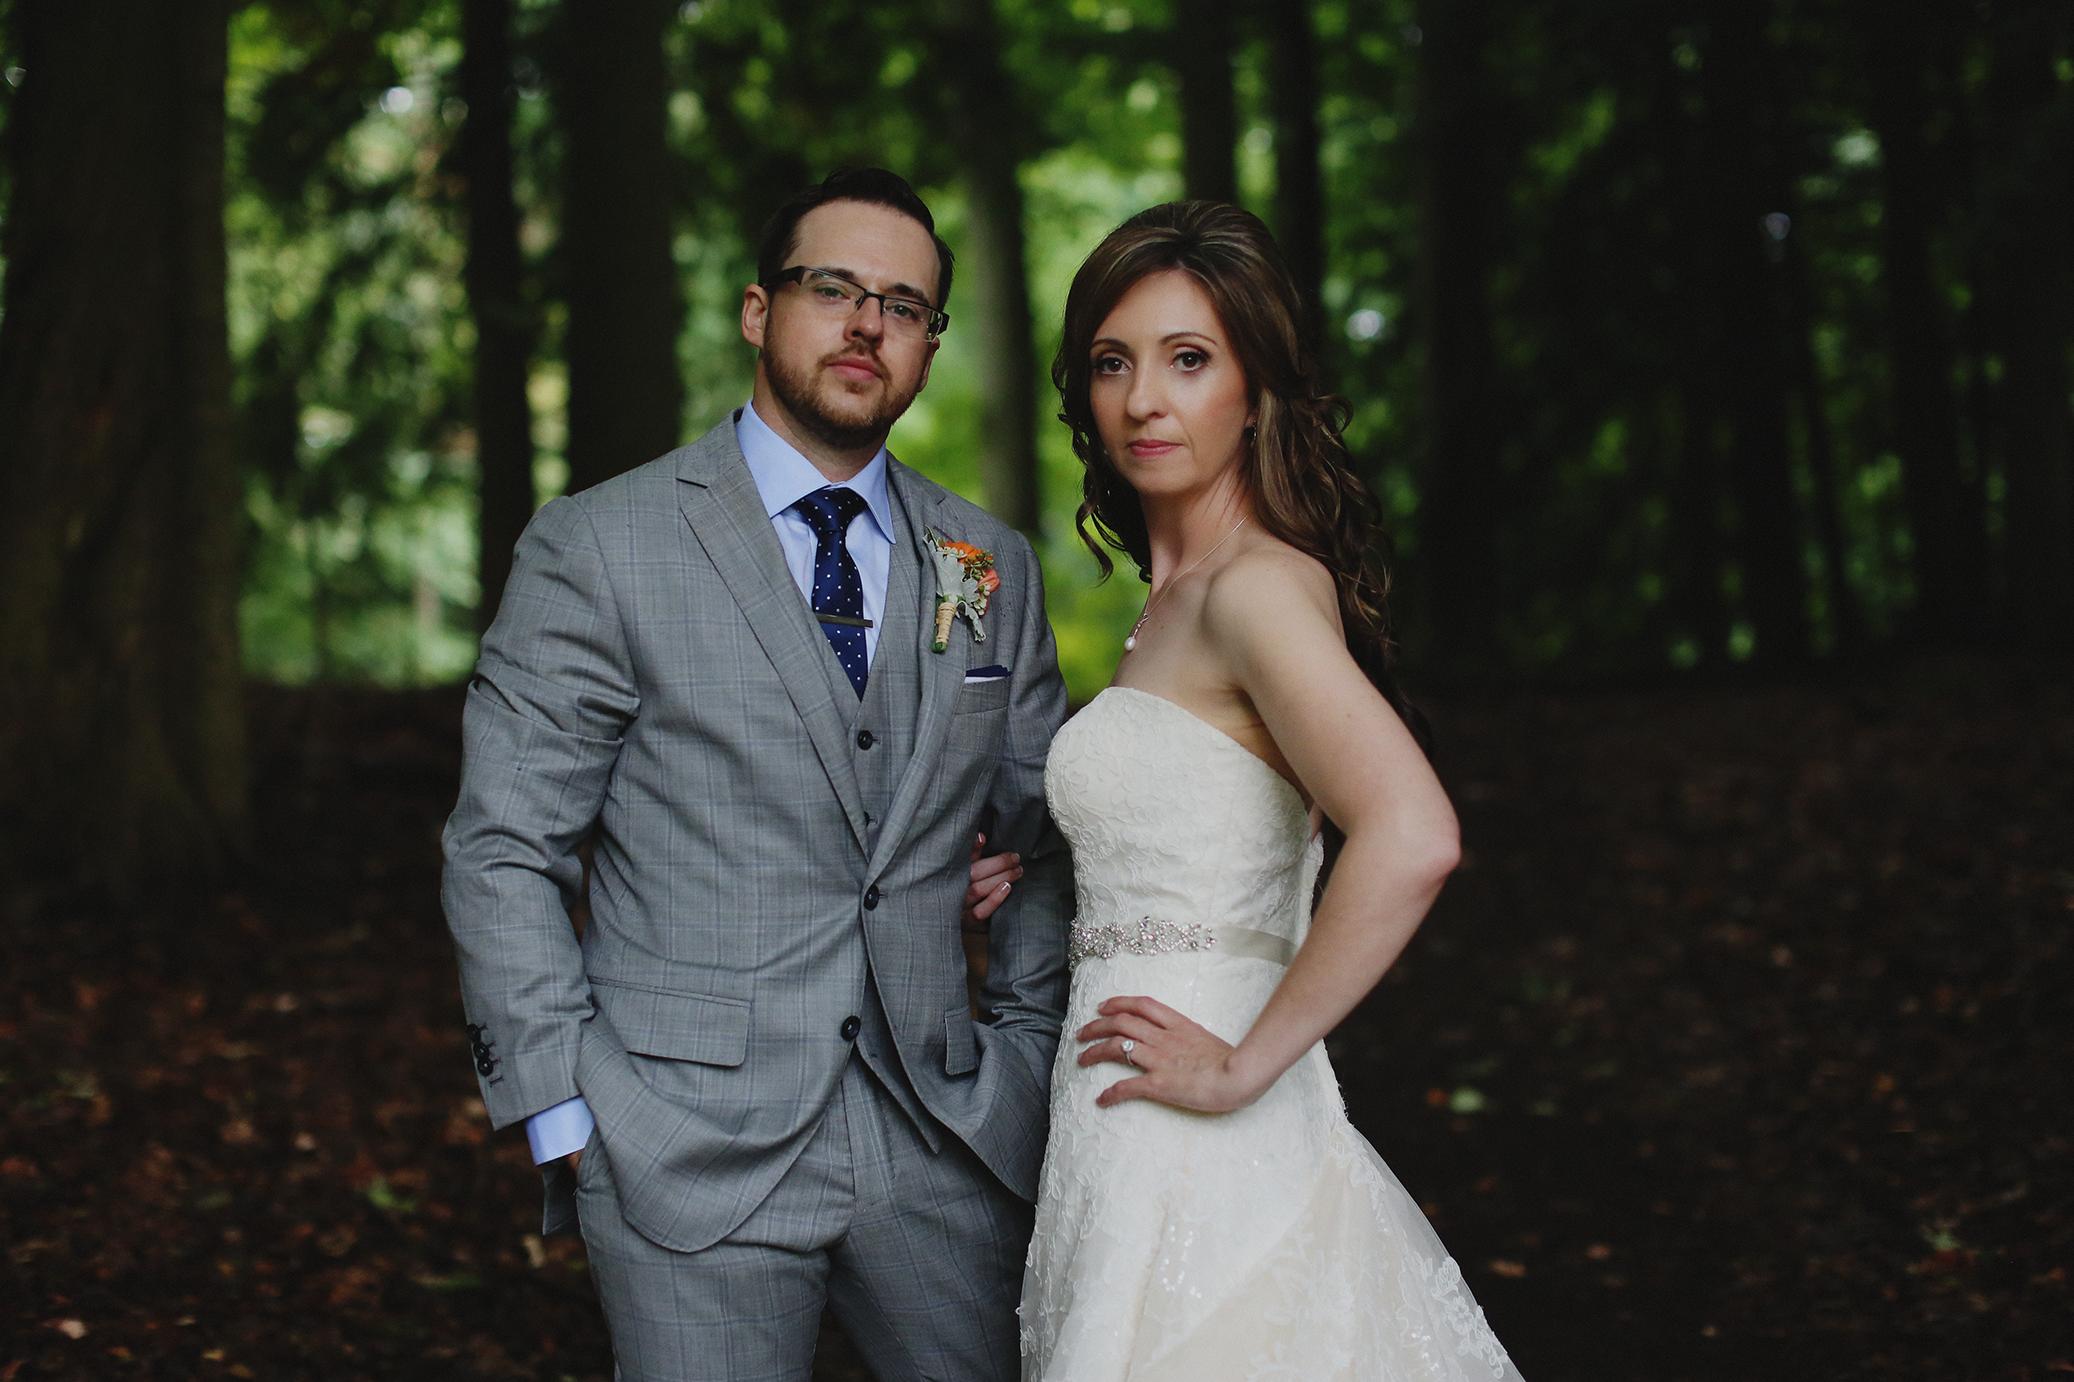 pheasant_run_wedding_0025